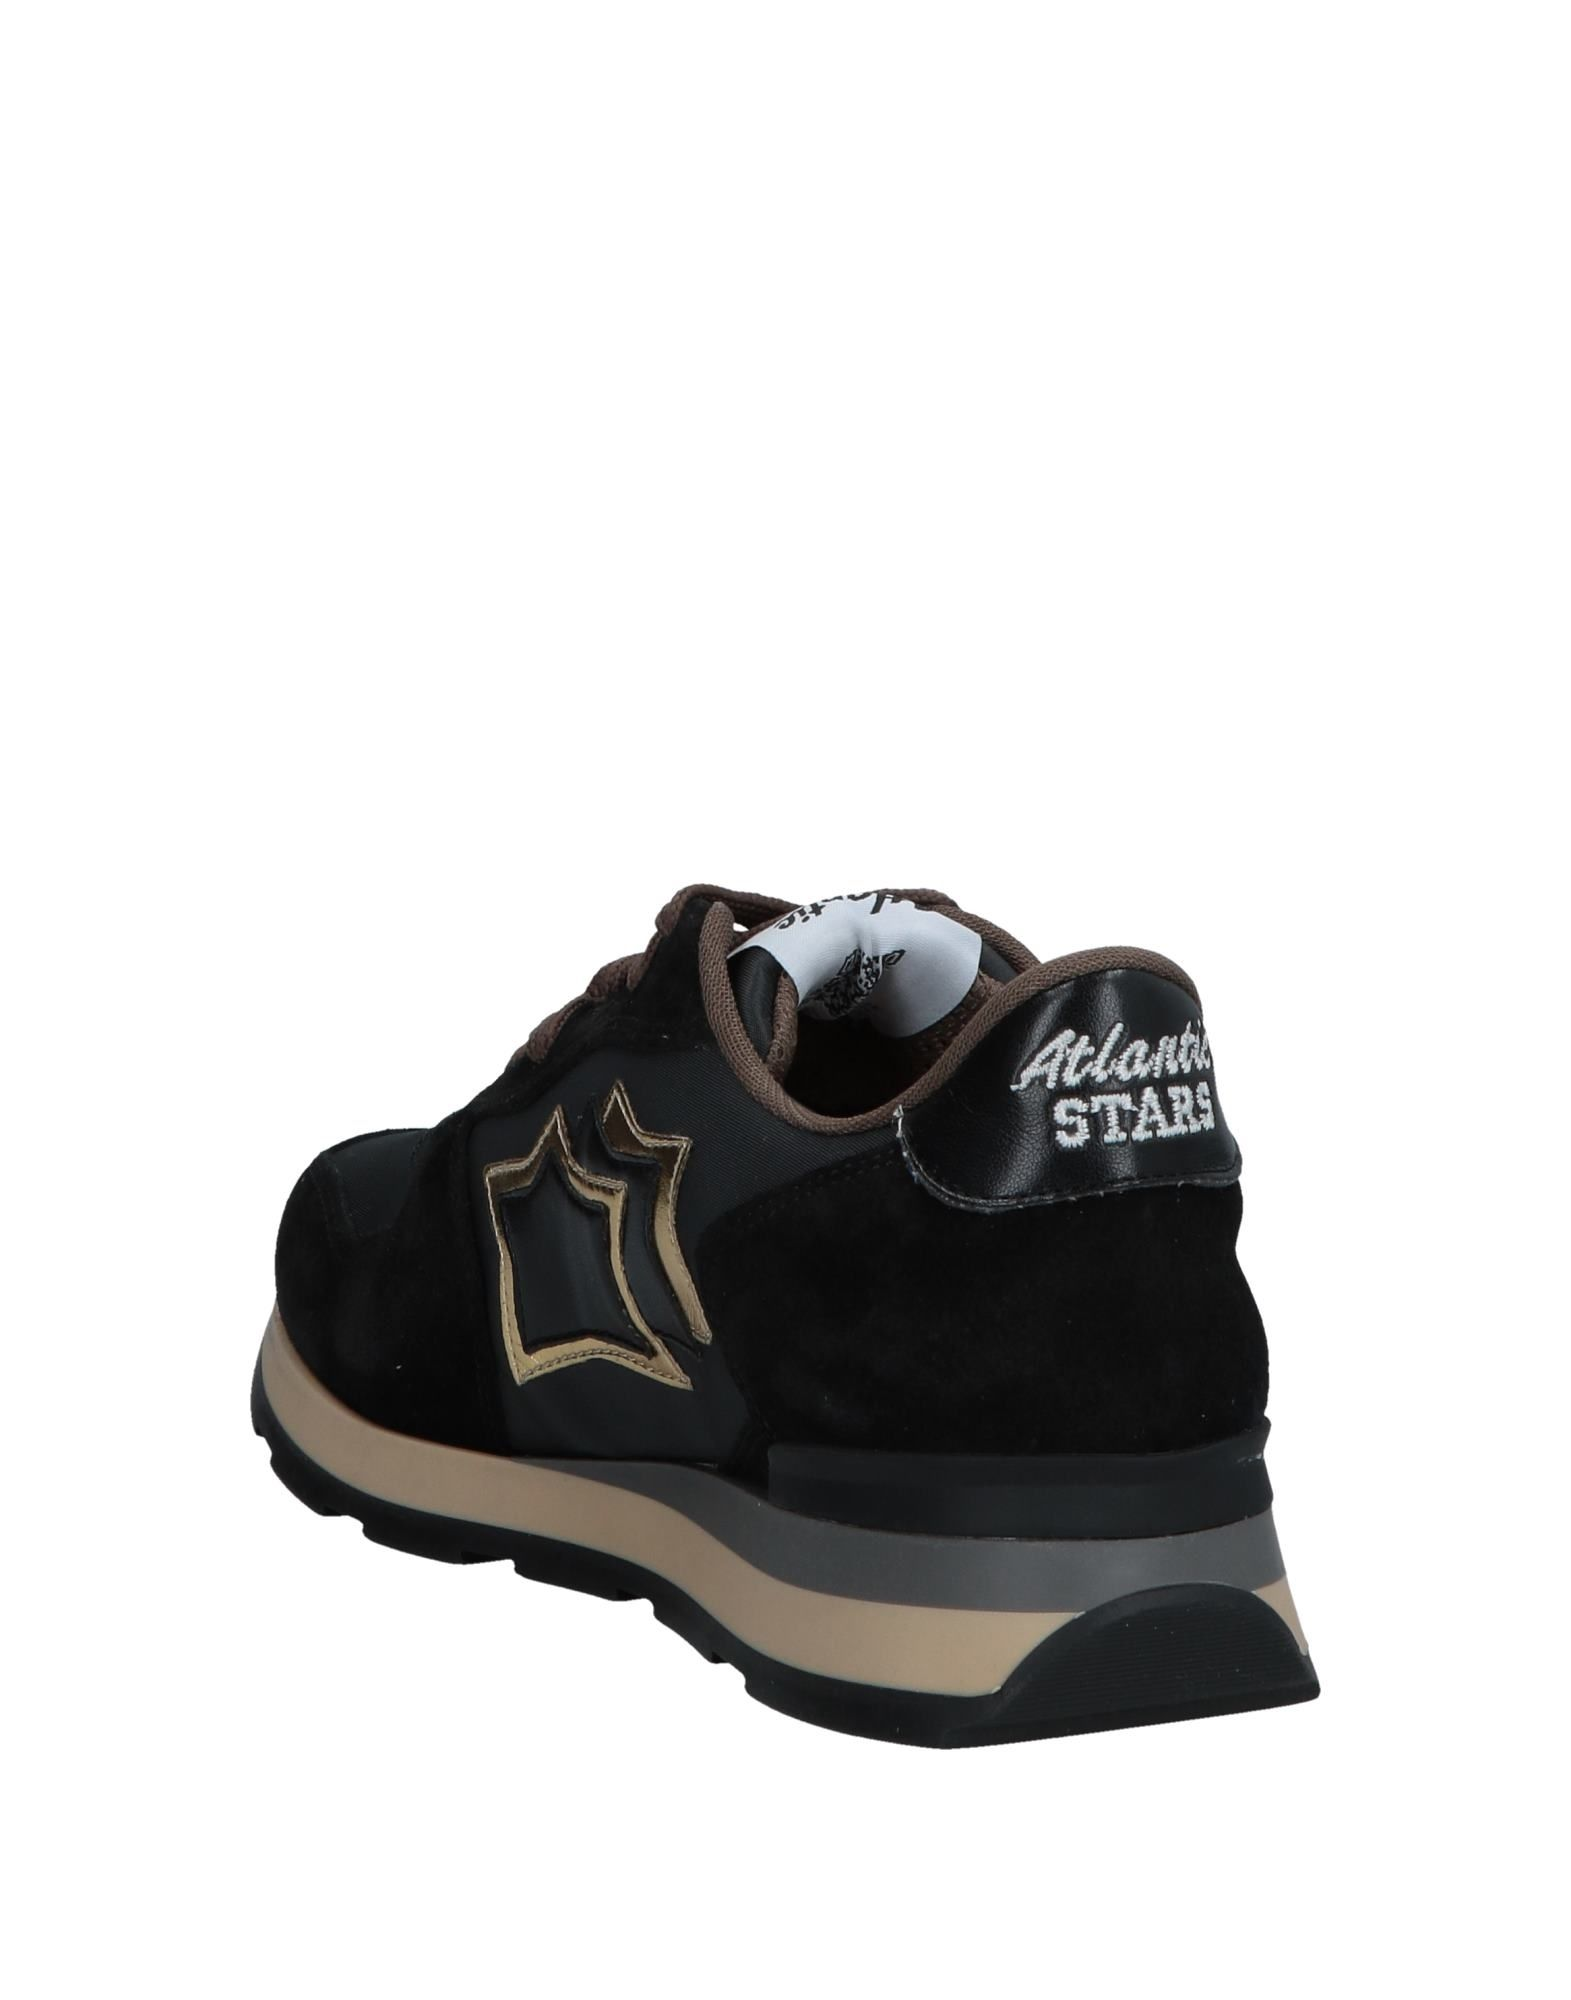 Gut um billige Schuhe Damen zu tragenAtlantic Stars Sneakers Damen Schuhe  11569059DG 9aadd1